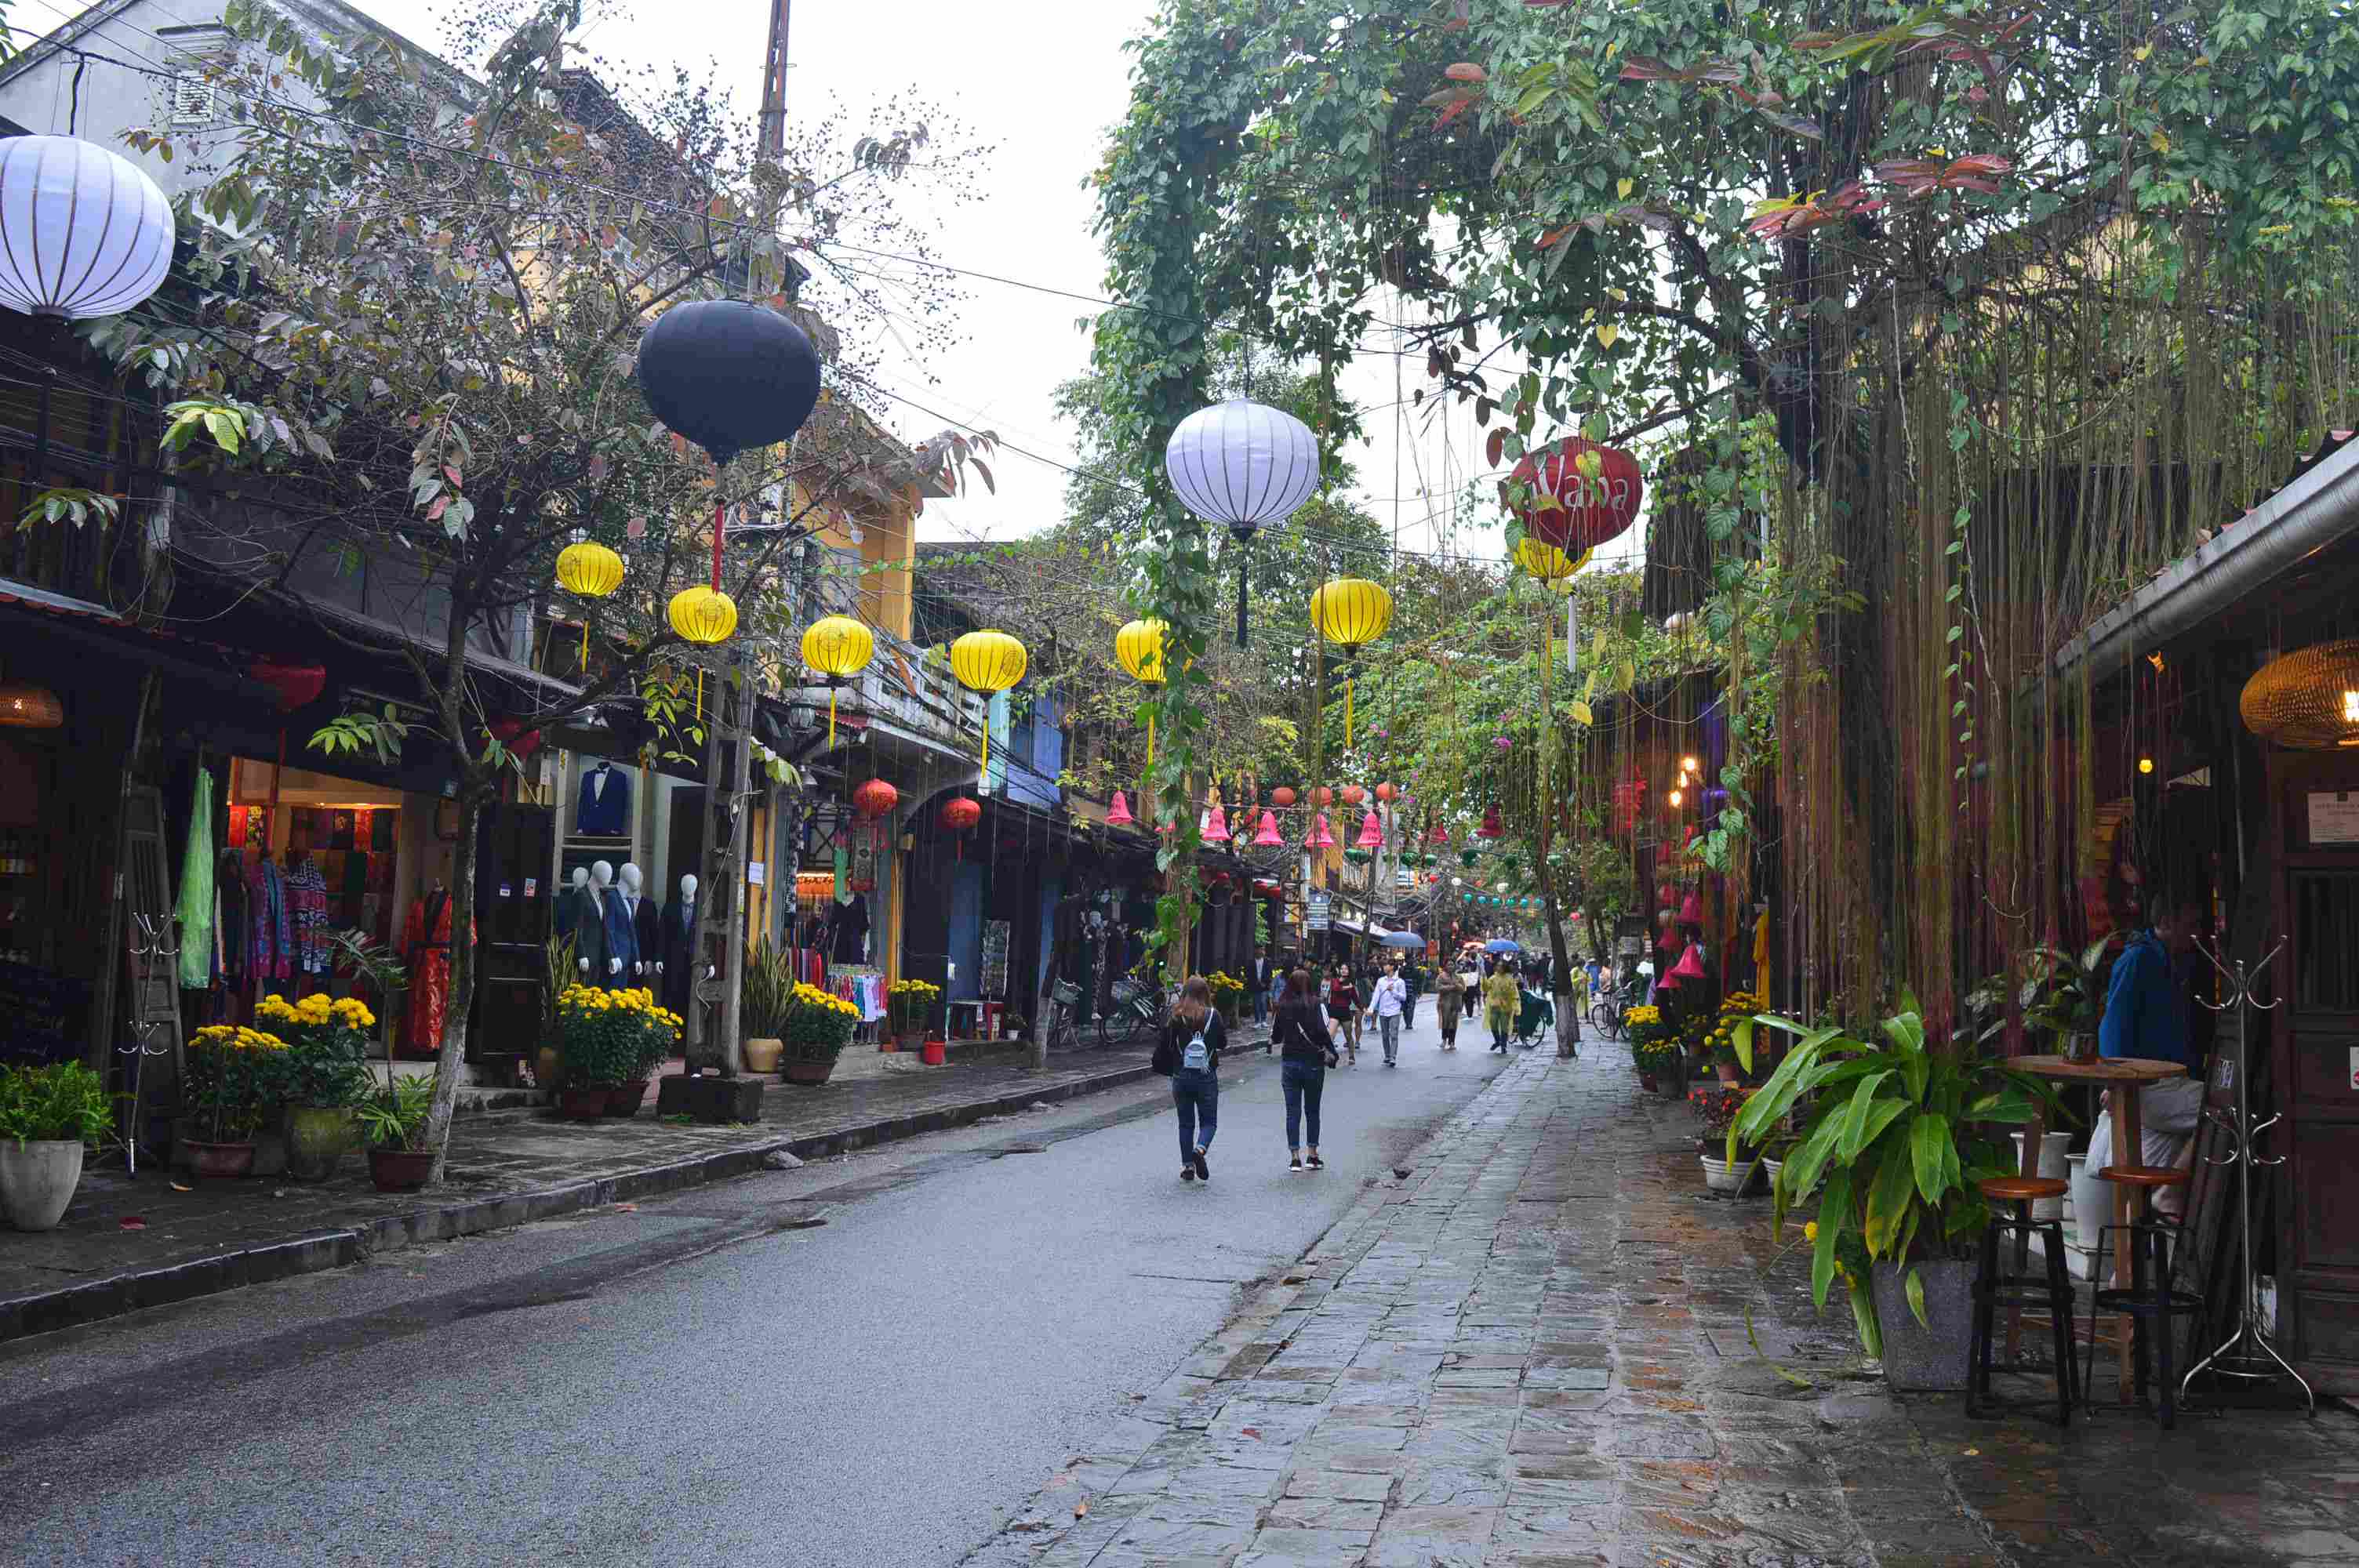 A corner of Hoi An Ancient Town (Photo: Q.T)